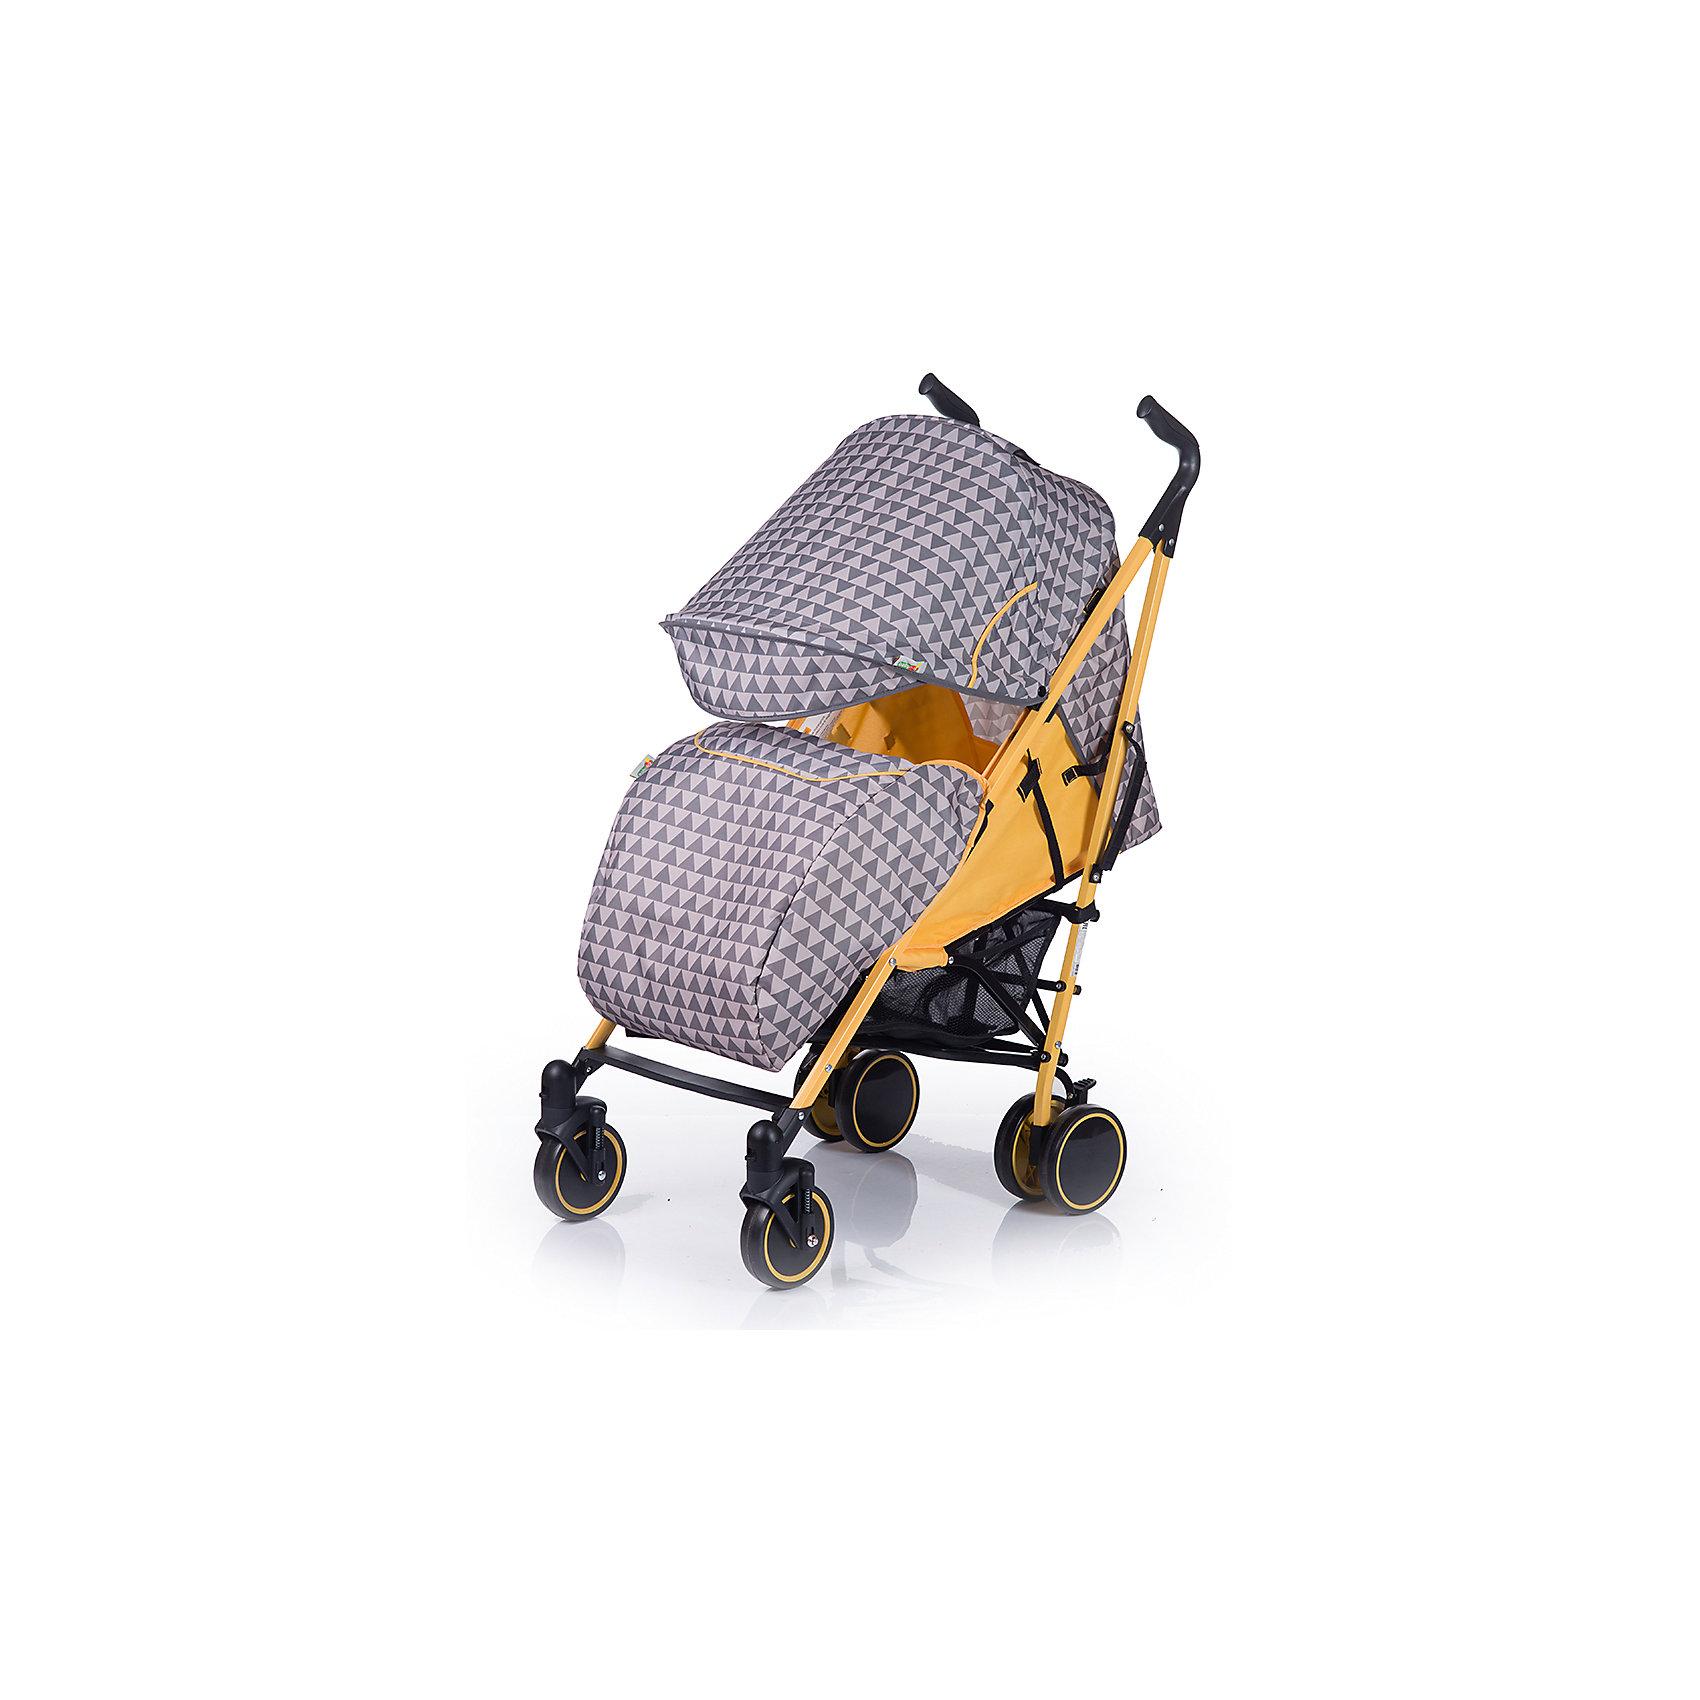 Baby Hit Коляска-трость BabyHit Handy, серый/жёлтый